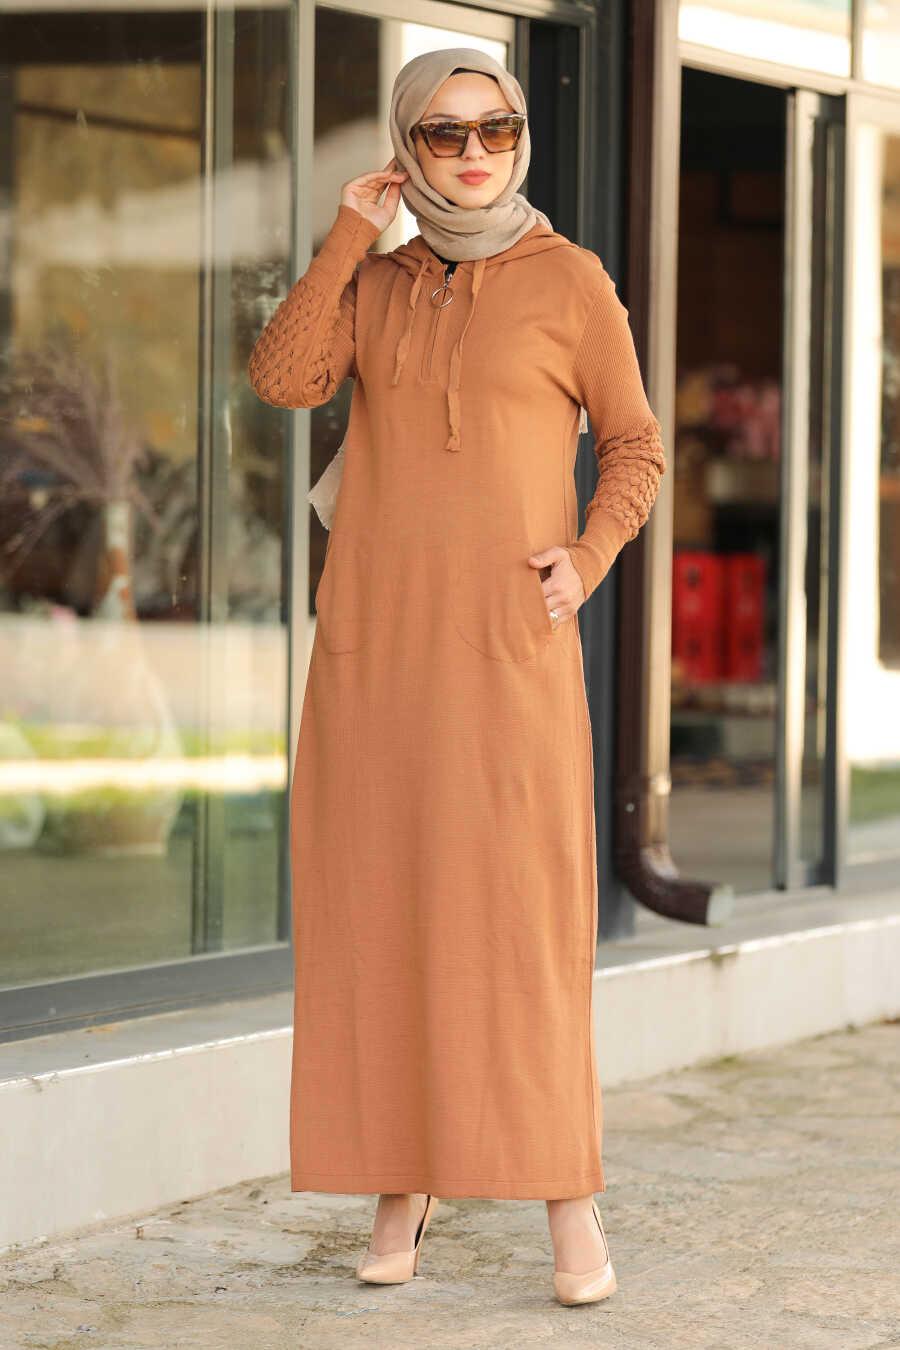 Biscuit Hijab Dress 2343BS